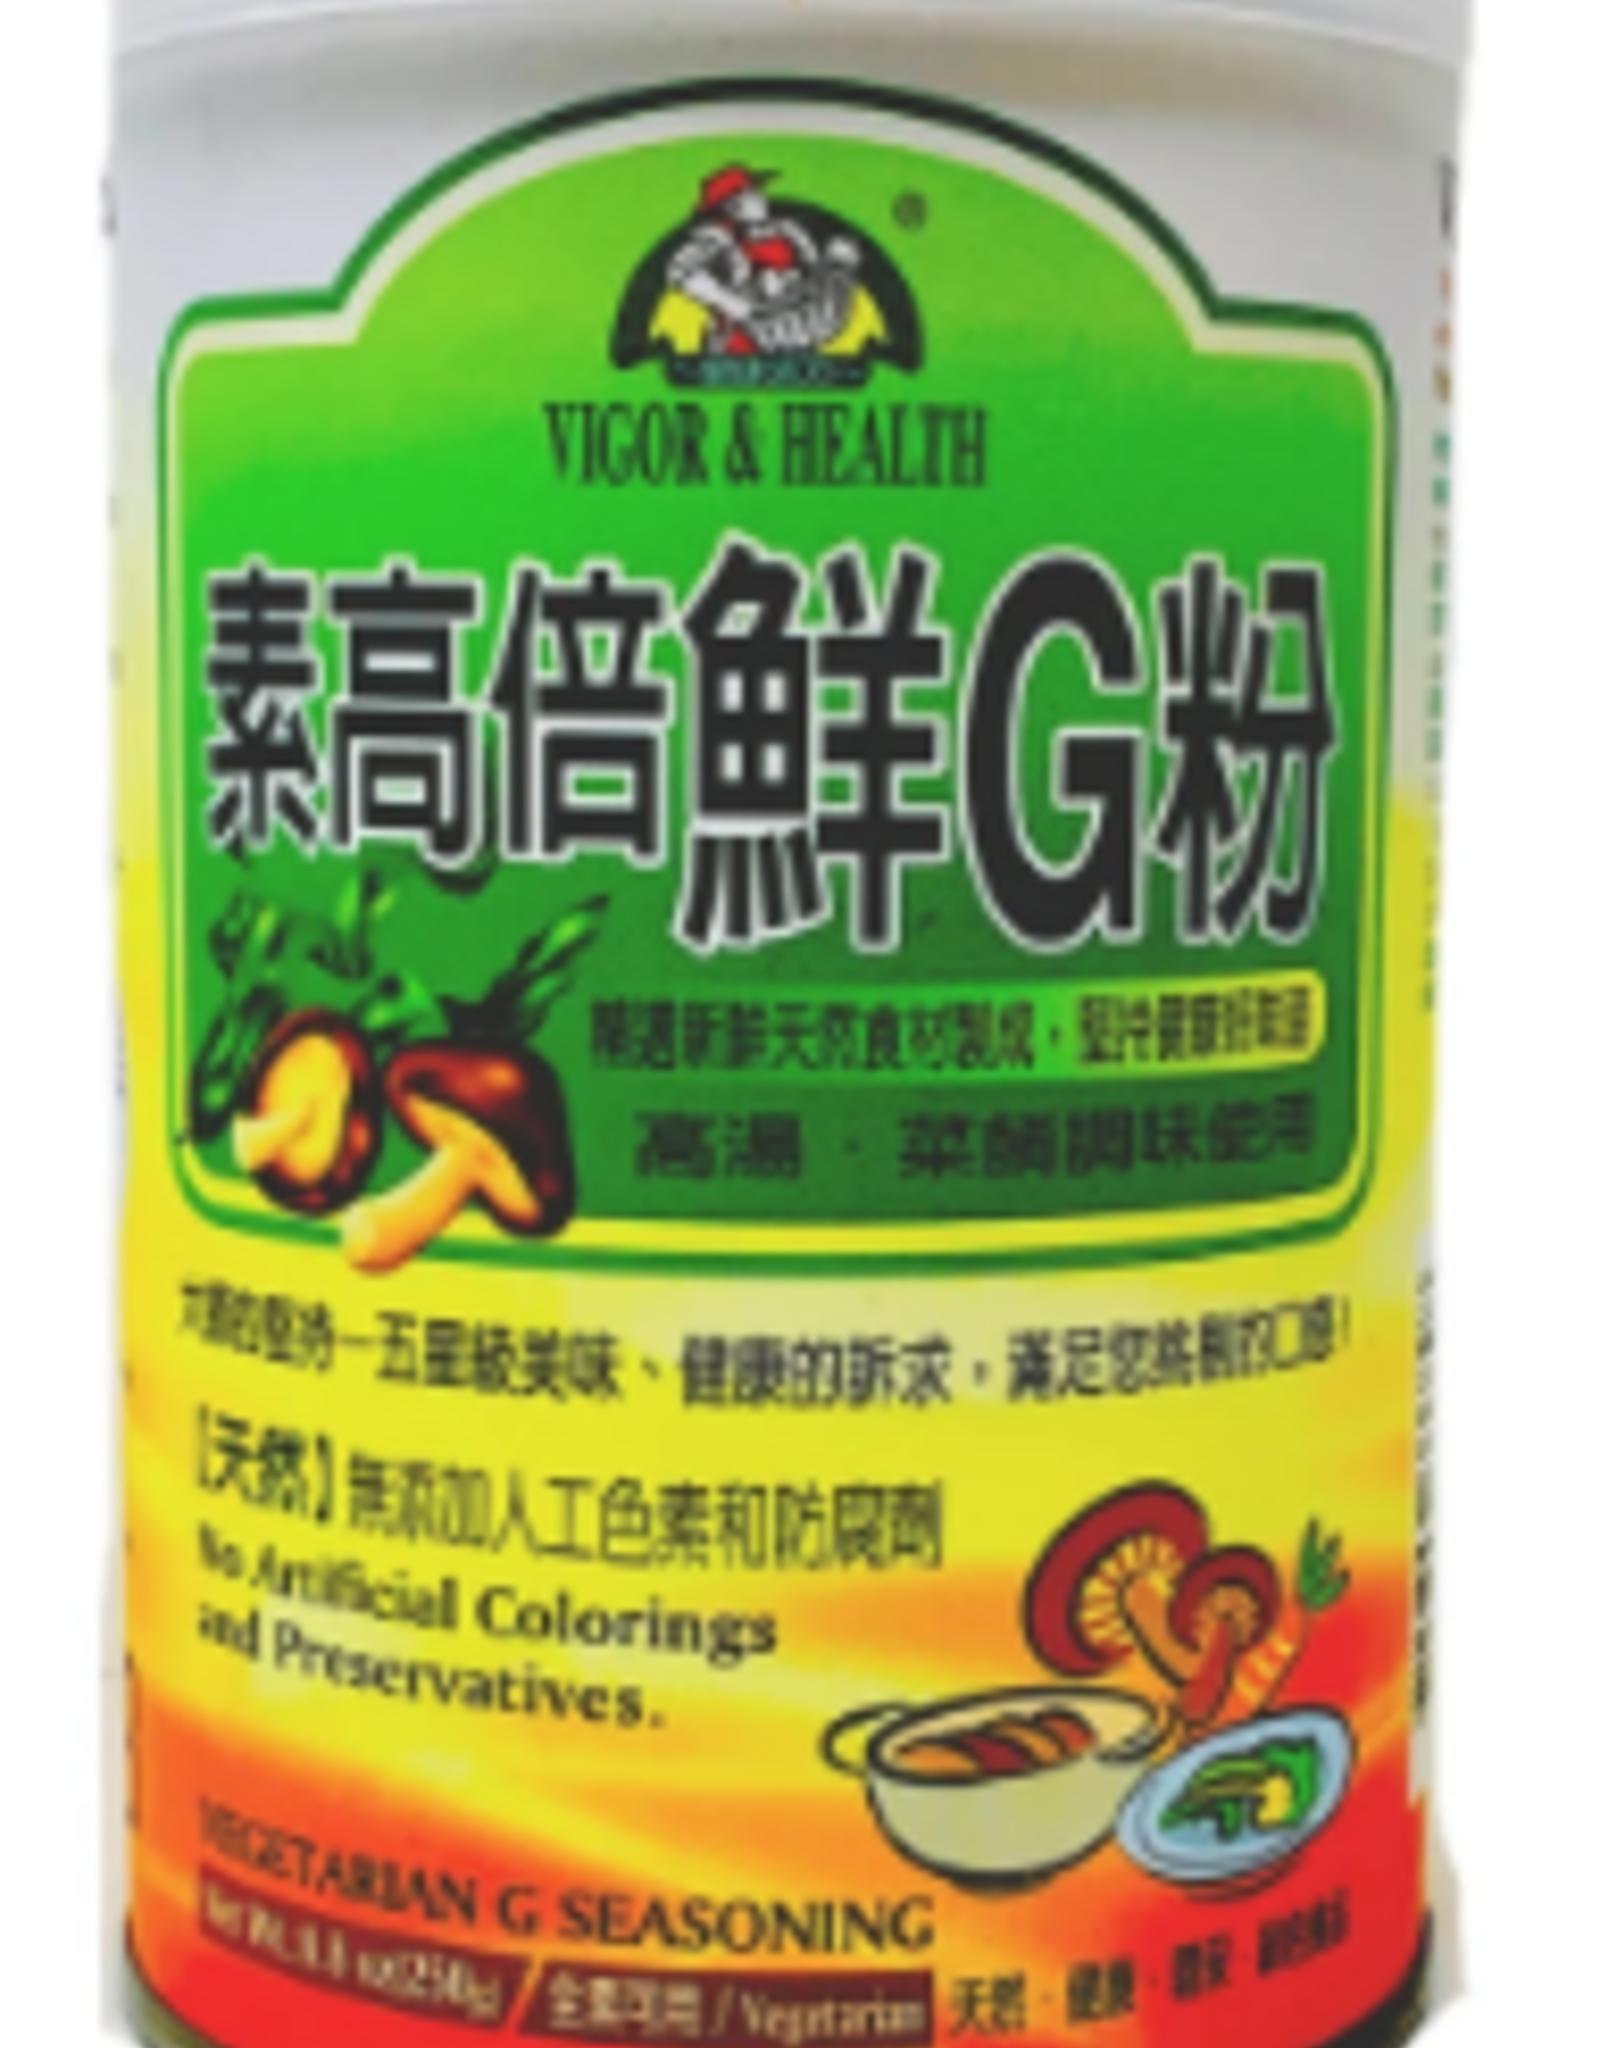 (UK) Vege G Seasoning*(有機廚坊) 素高倍鮮G粉